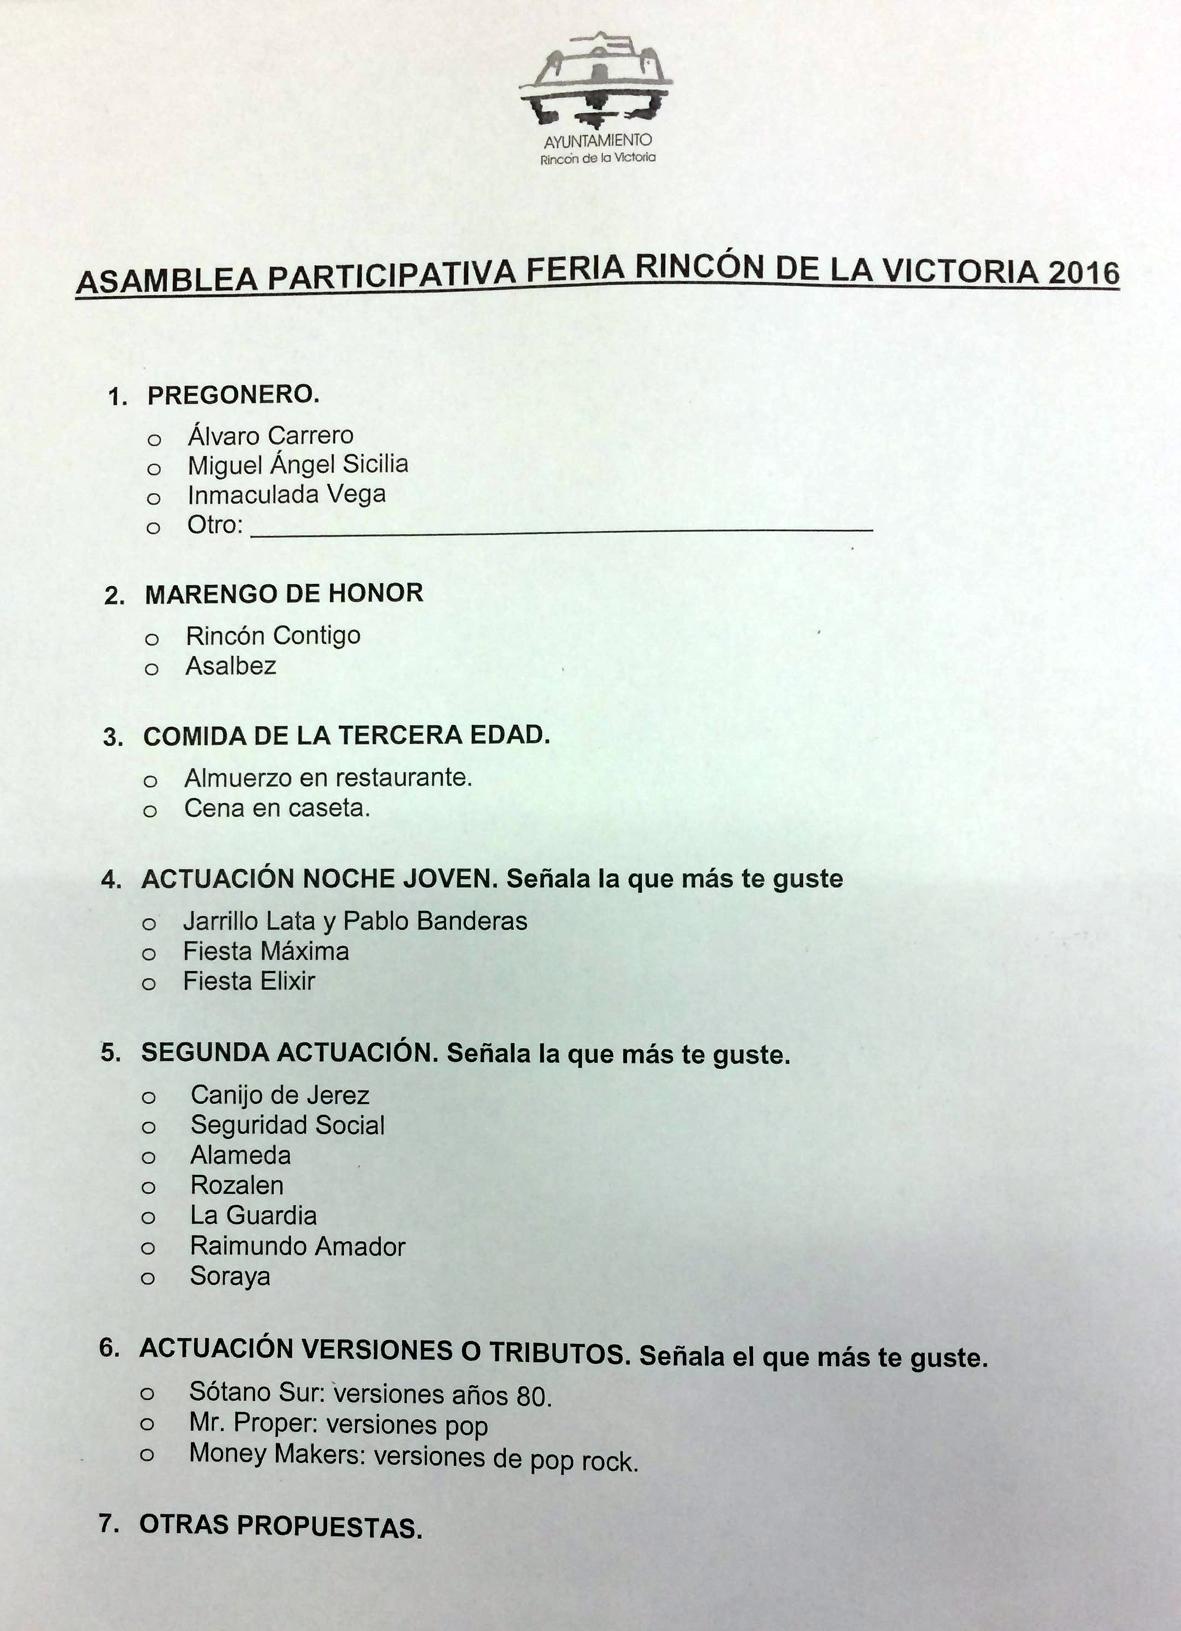 Arrinconados_Feria_Rincon_1